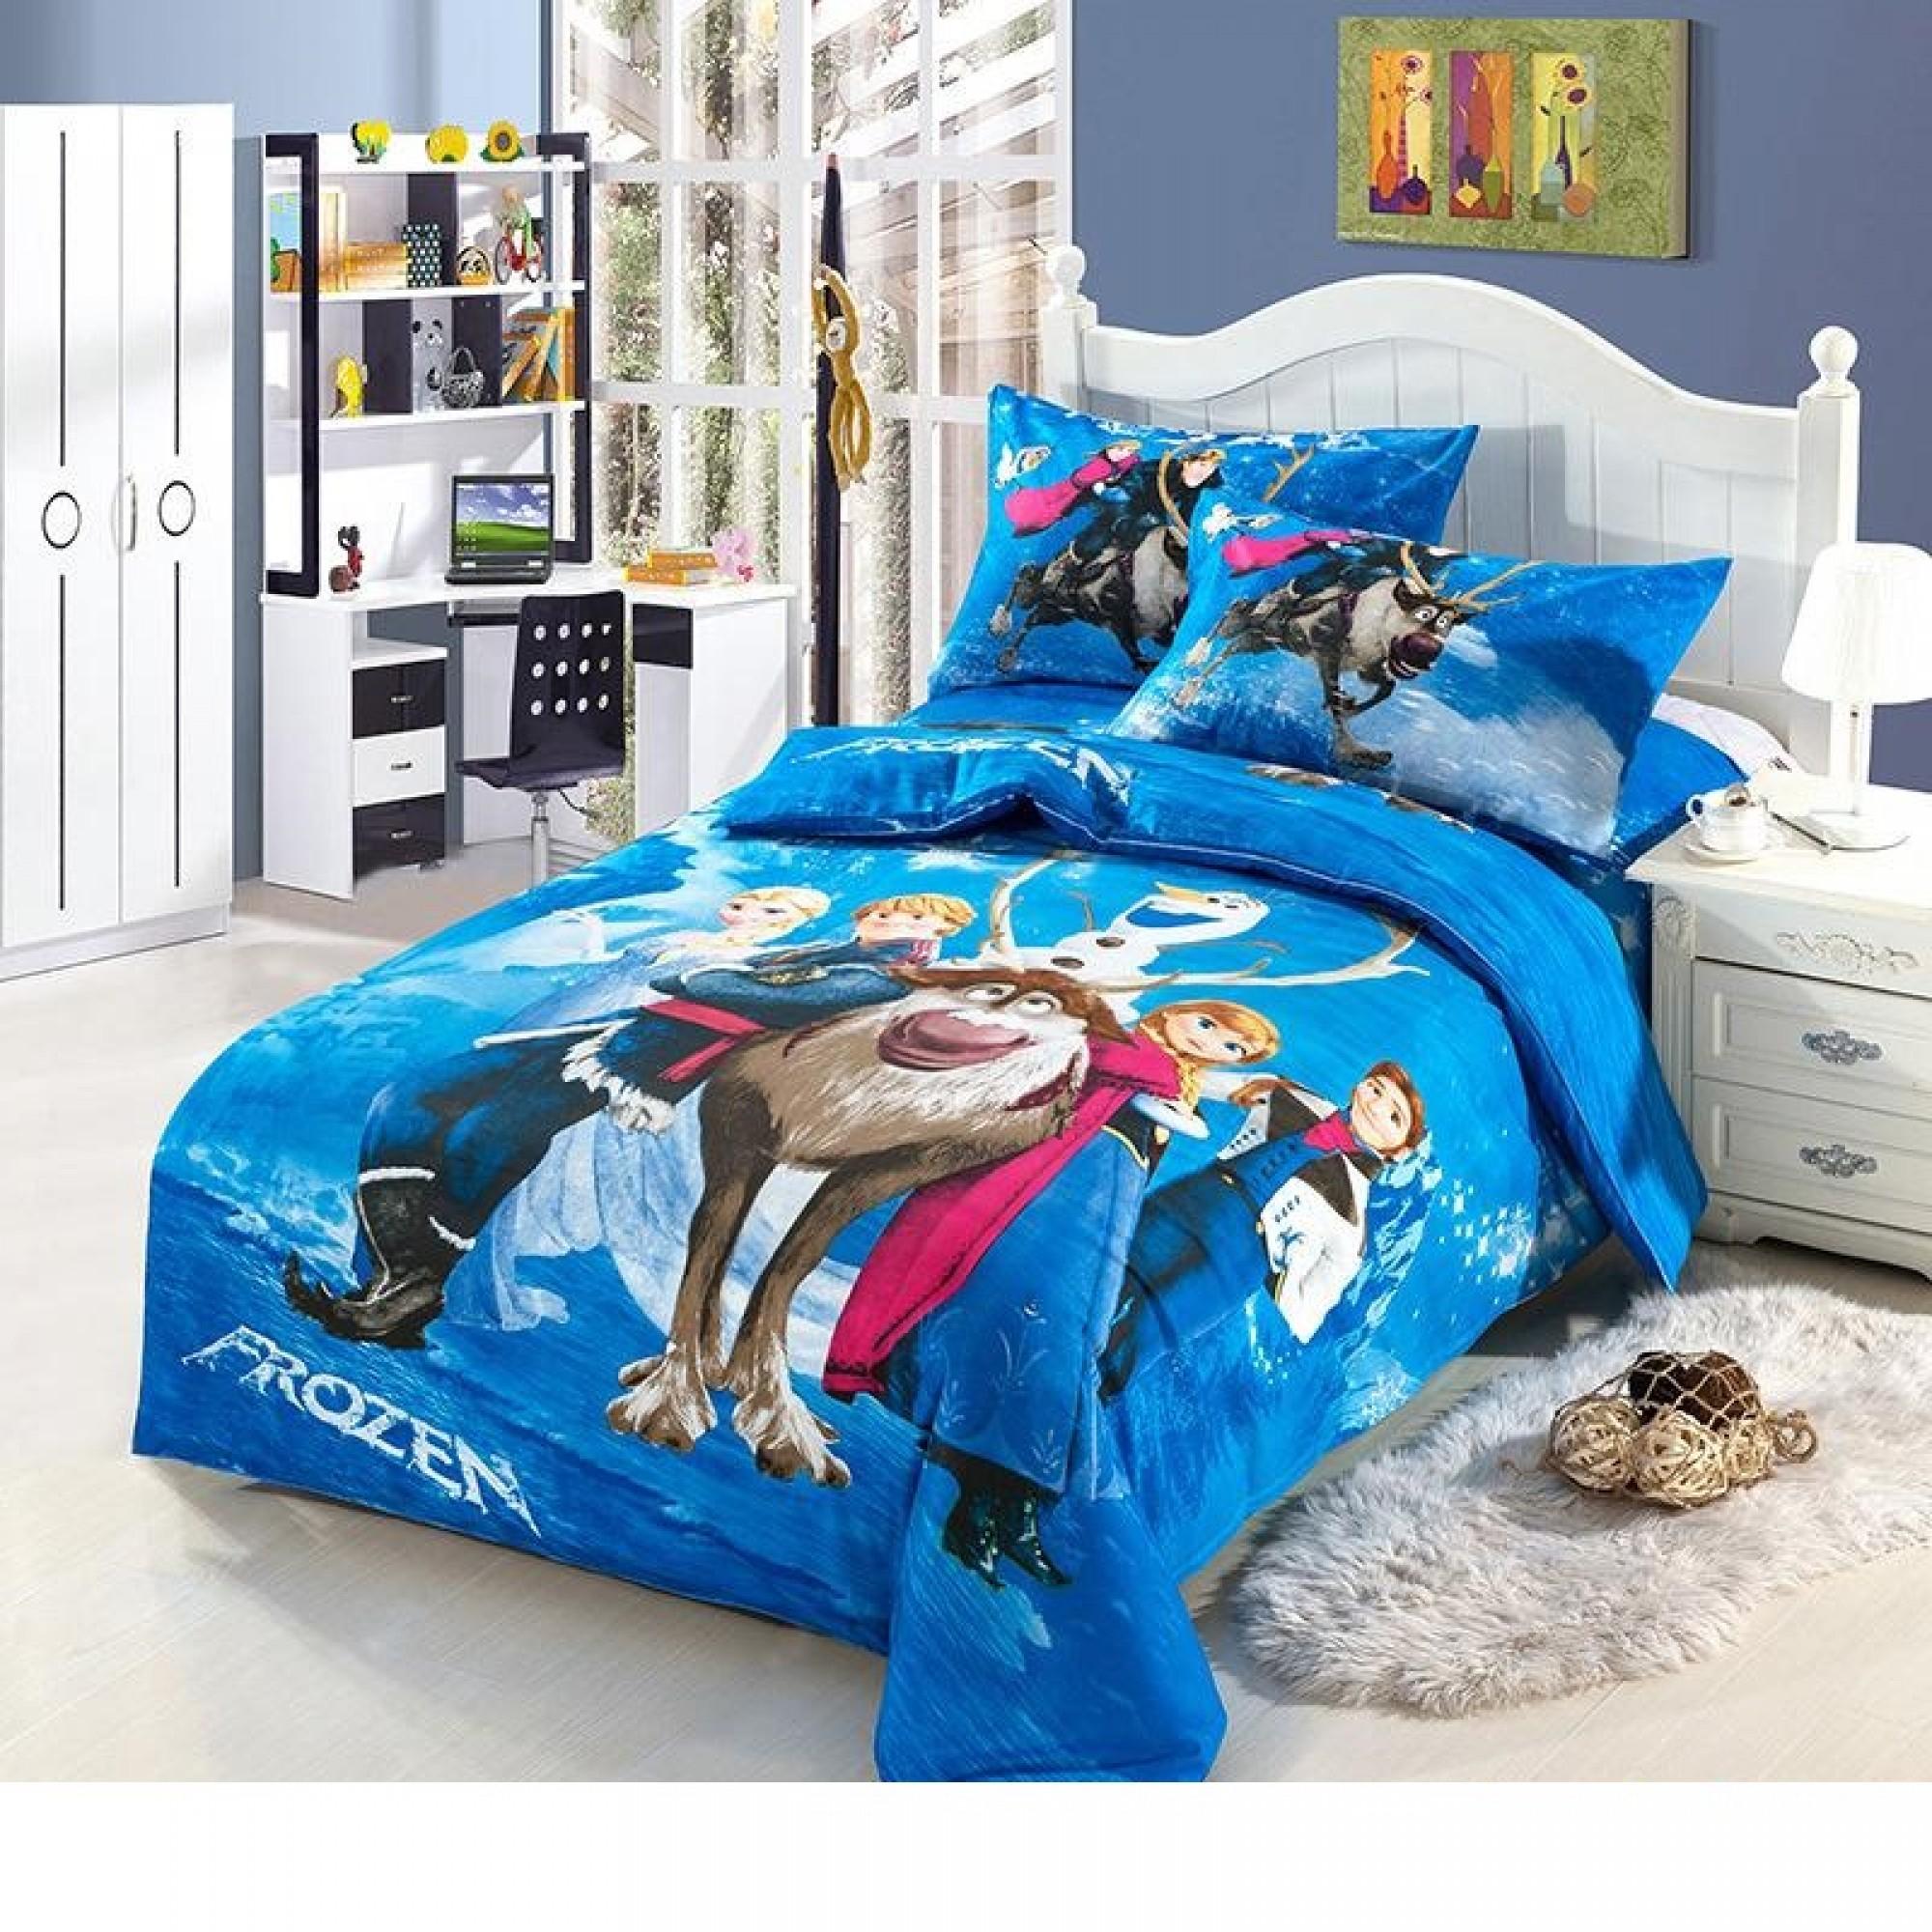 Детско спално бельо Замръзналото кралство синьо 100% памук